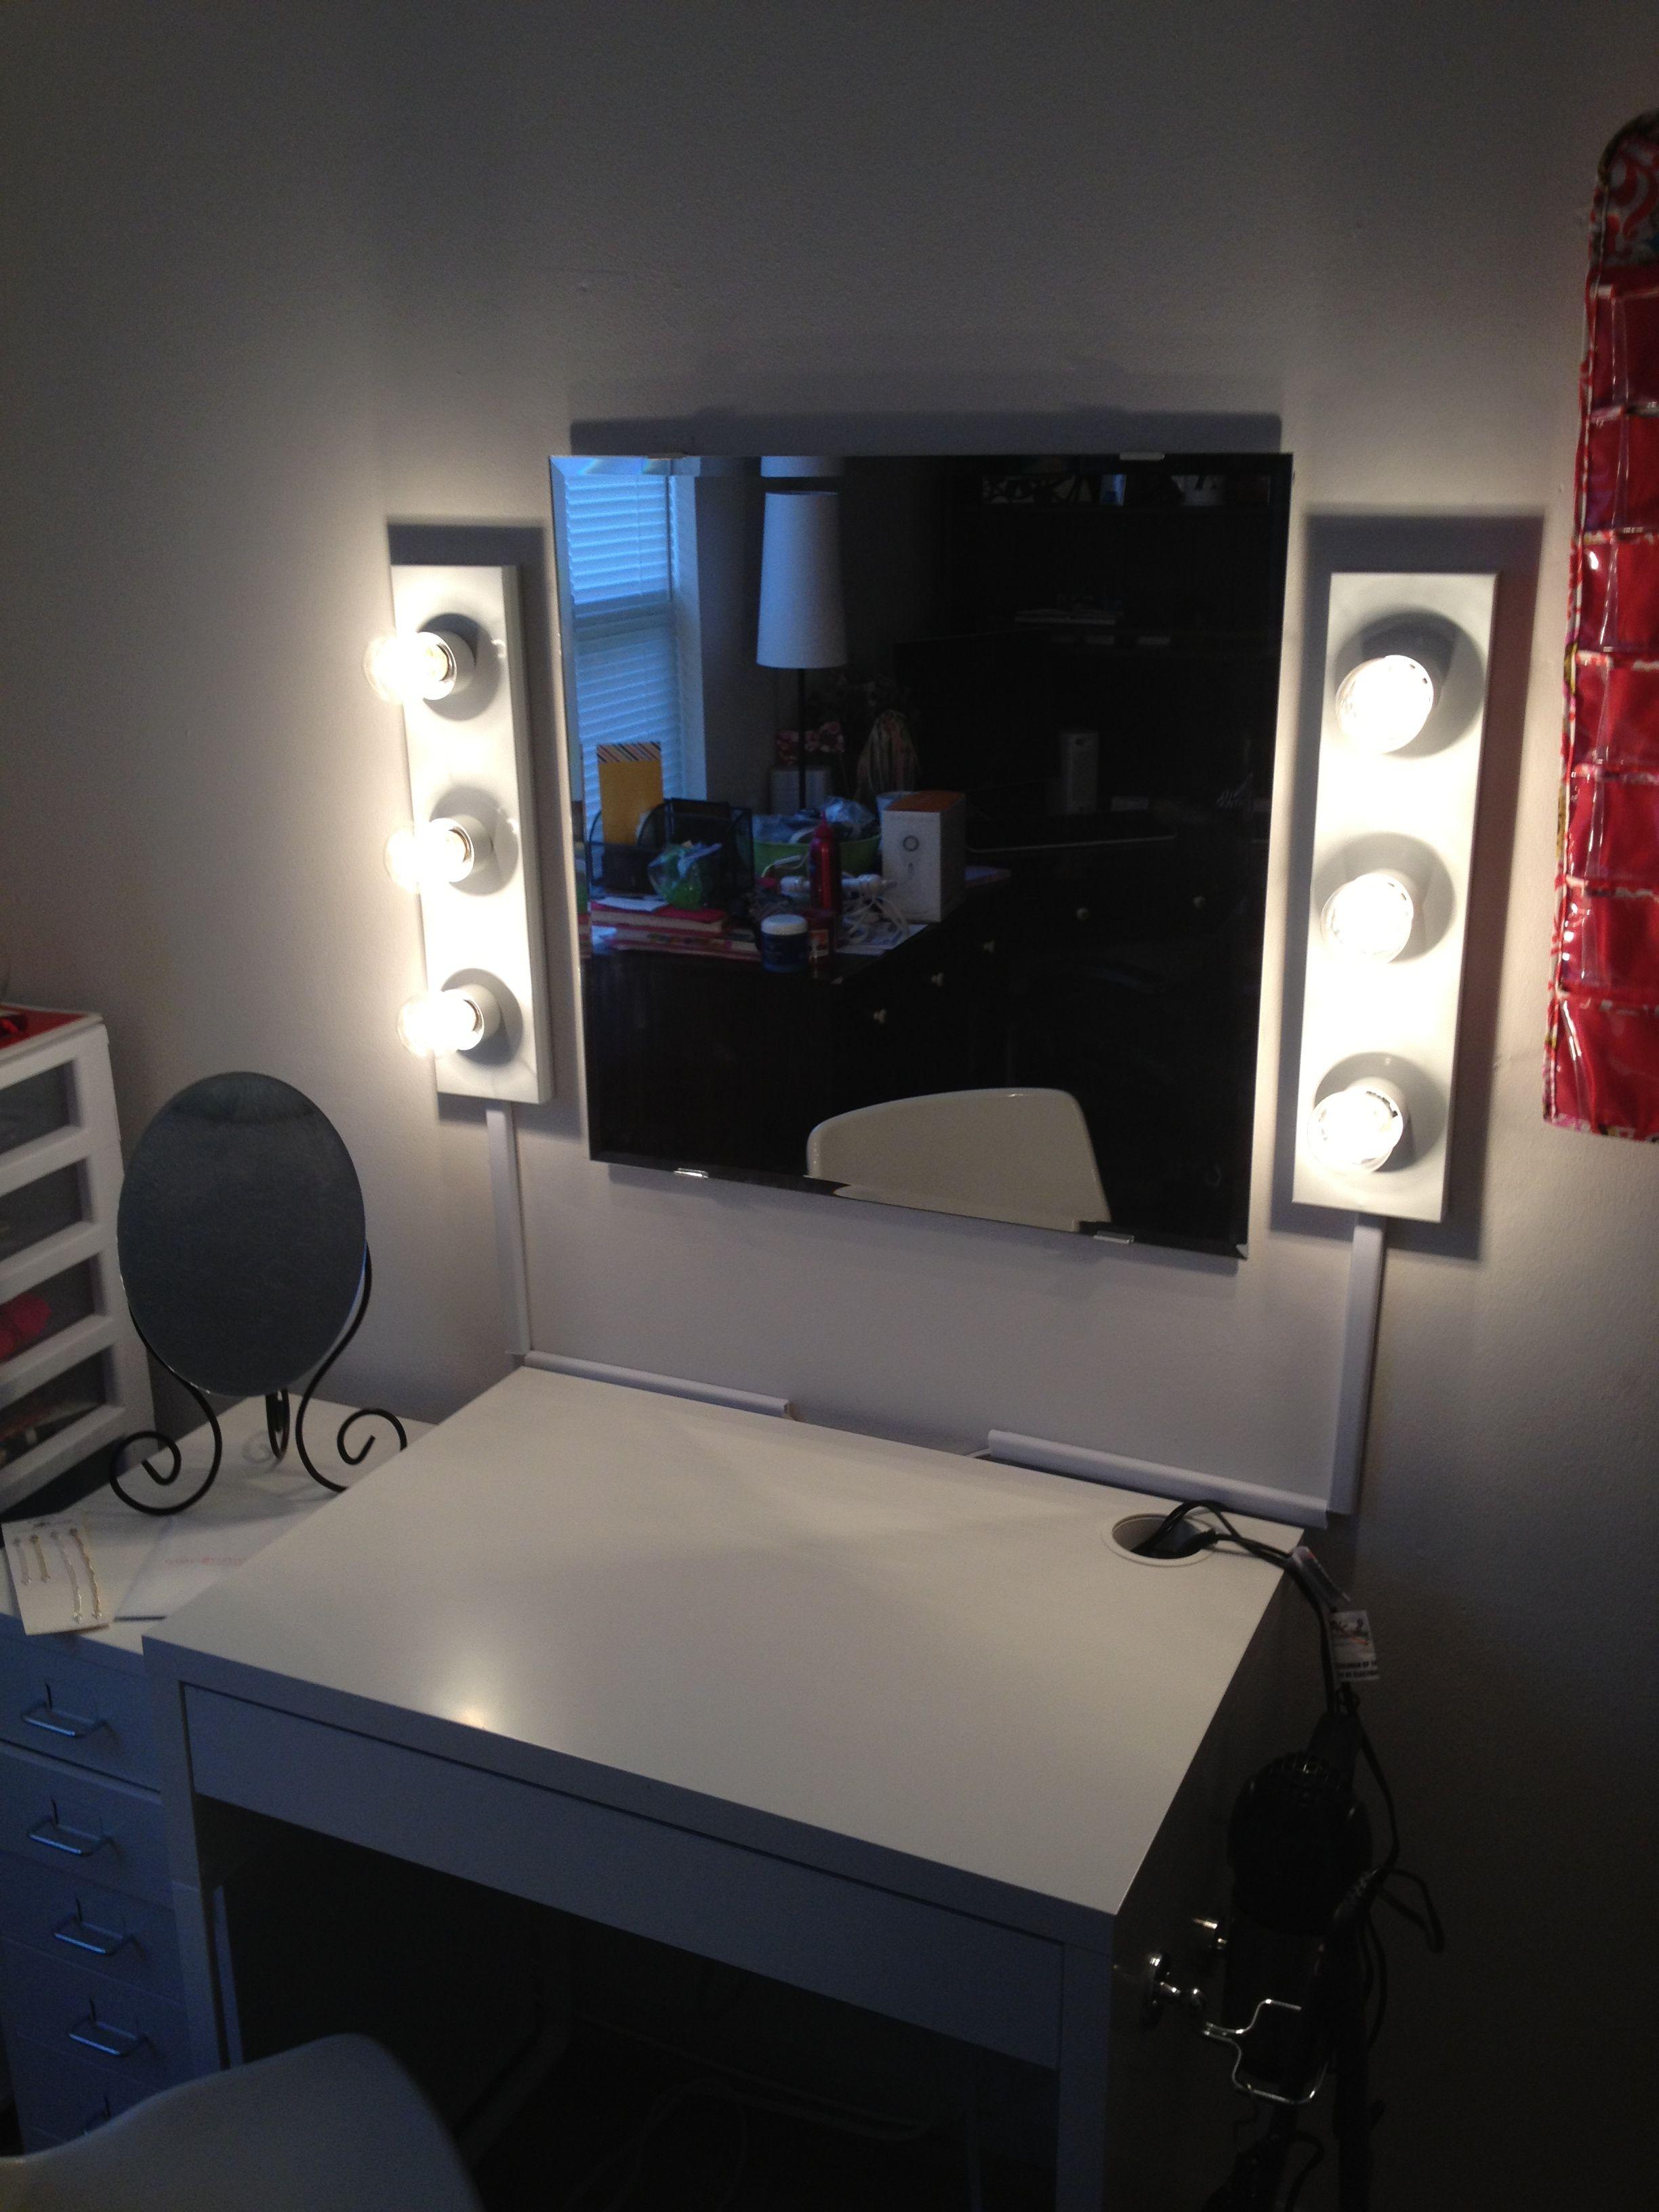 Turn bathroom vanity lights into makeup table lights with simple ...